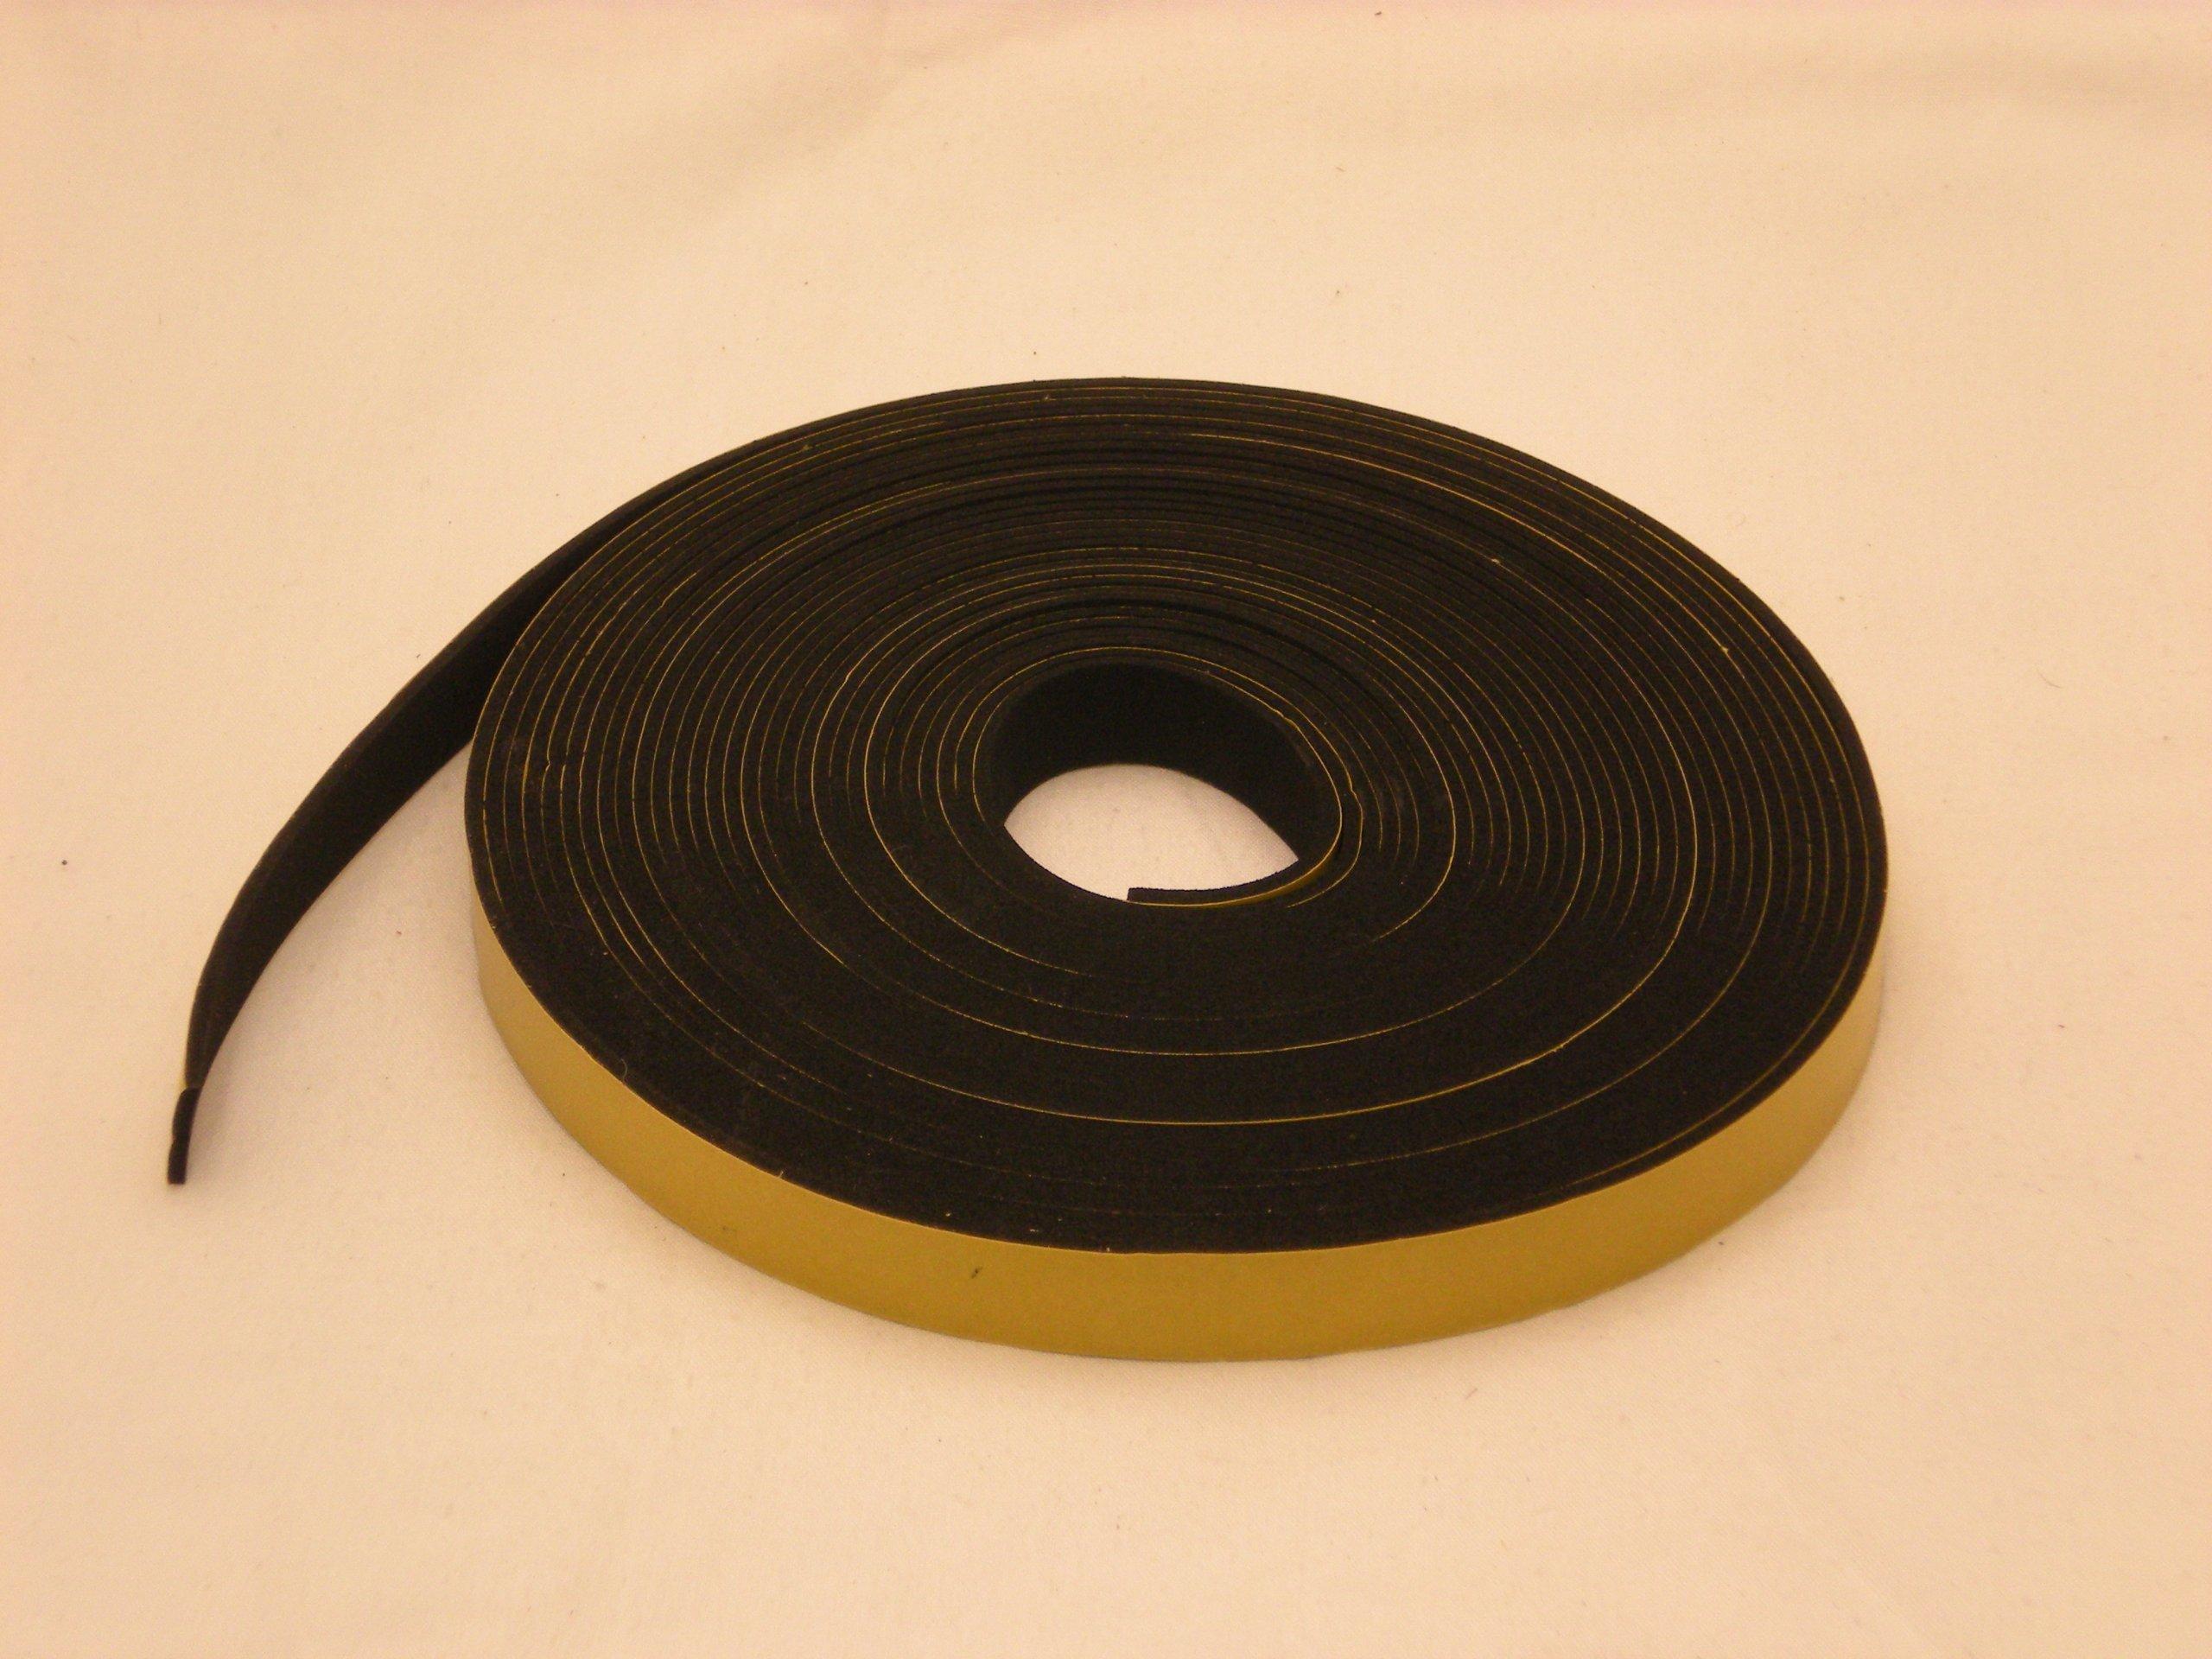 Neoprene Rubber Black Self-Adhesive Sponge Strip 2 Wide x 5//64 Thick x 16 feet Long